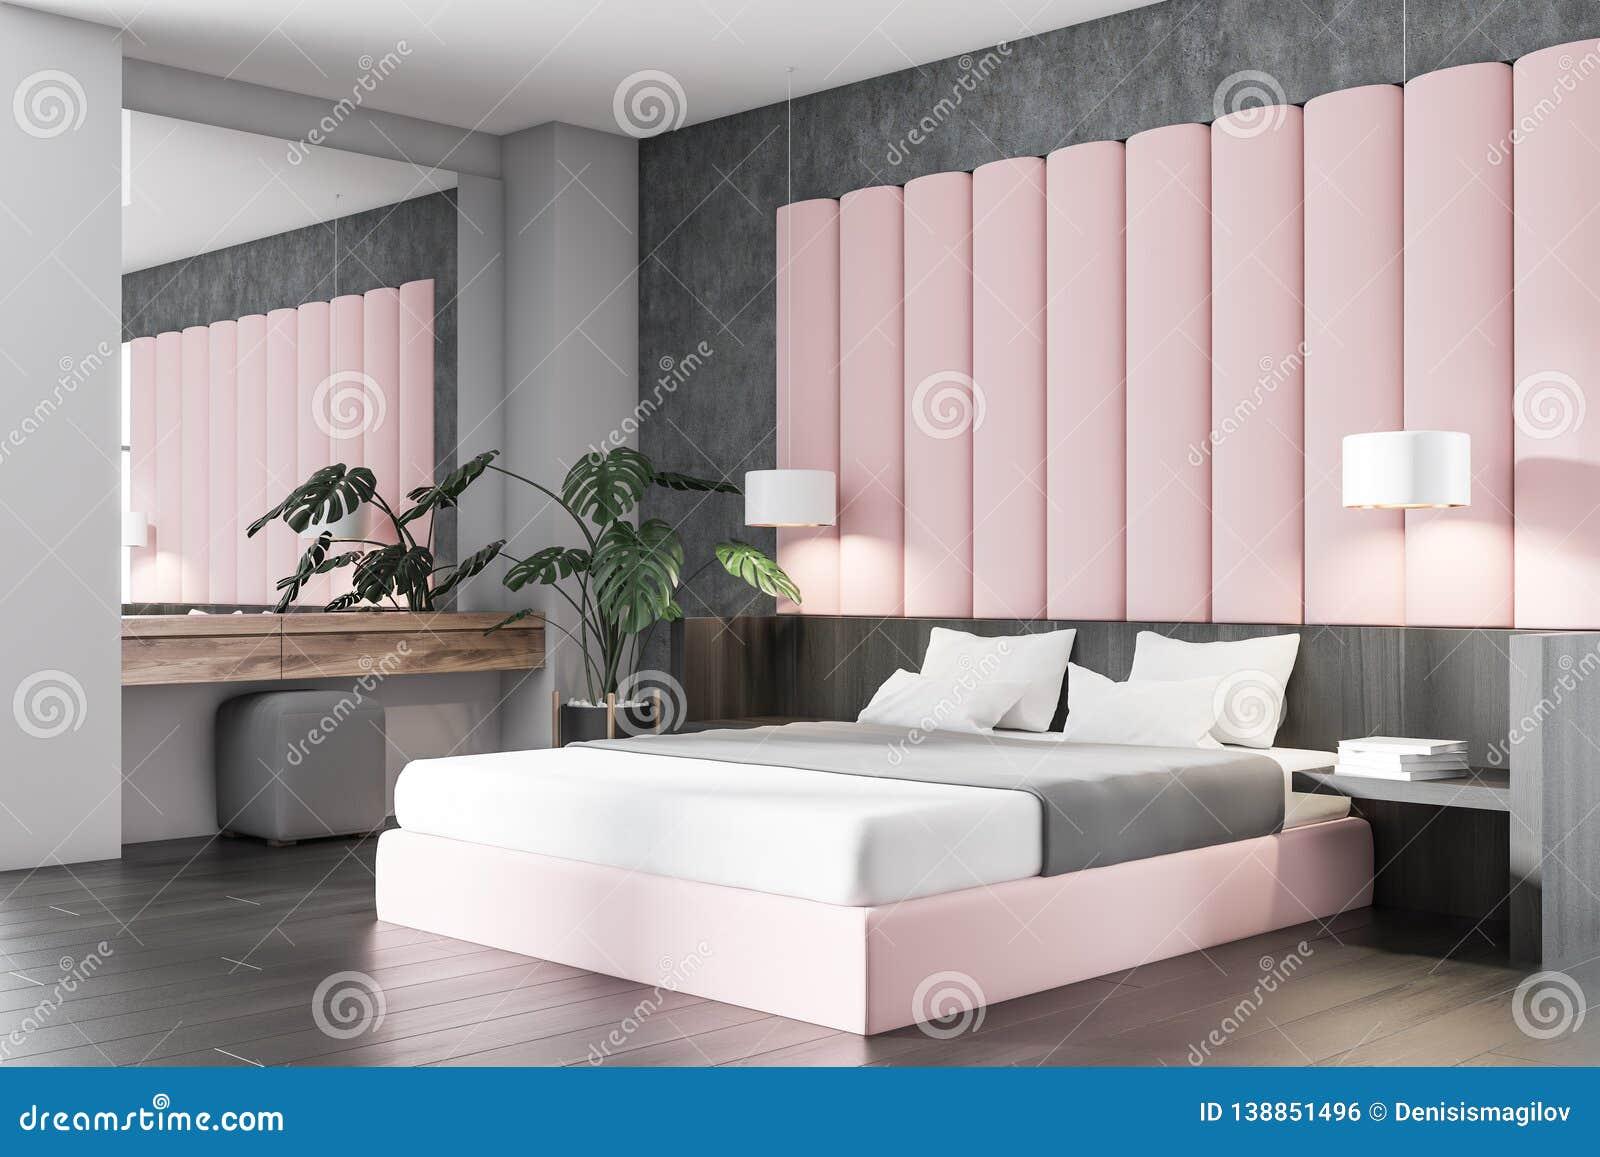 Pink And Gray Bedroom Corner Stock Illustration ...